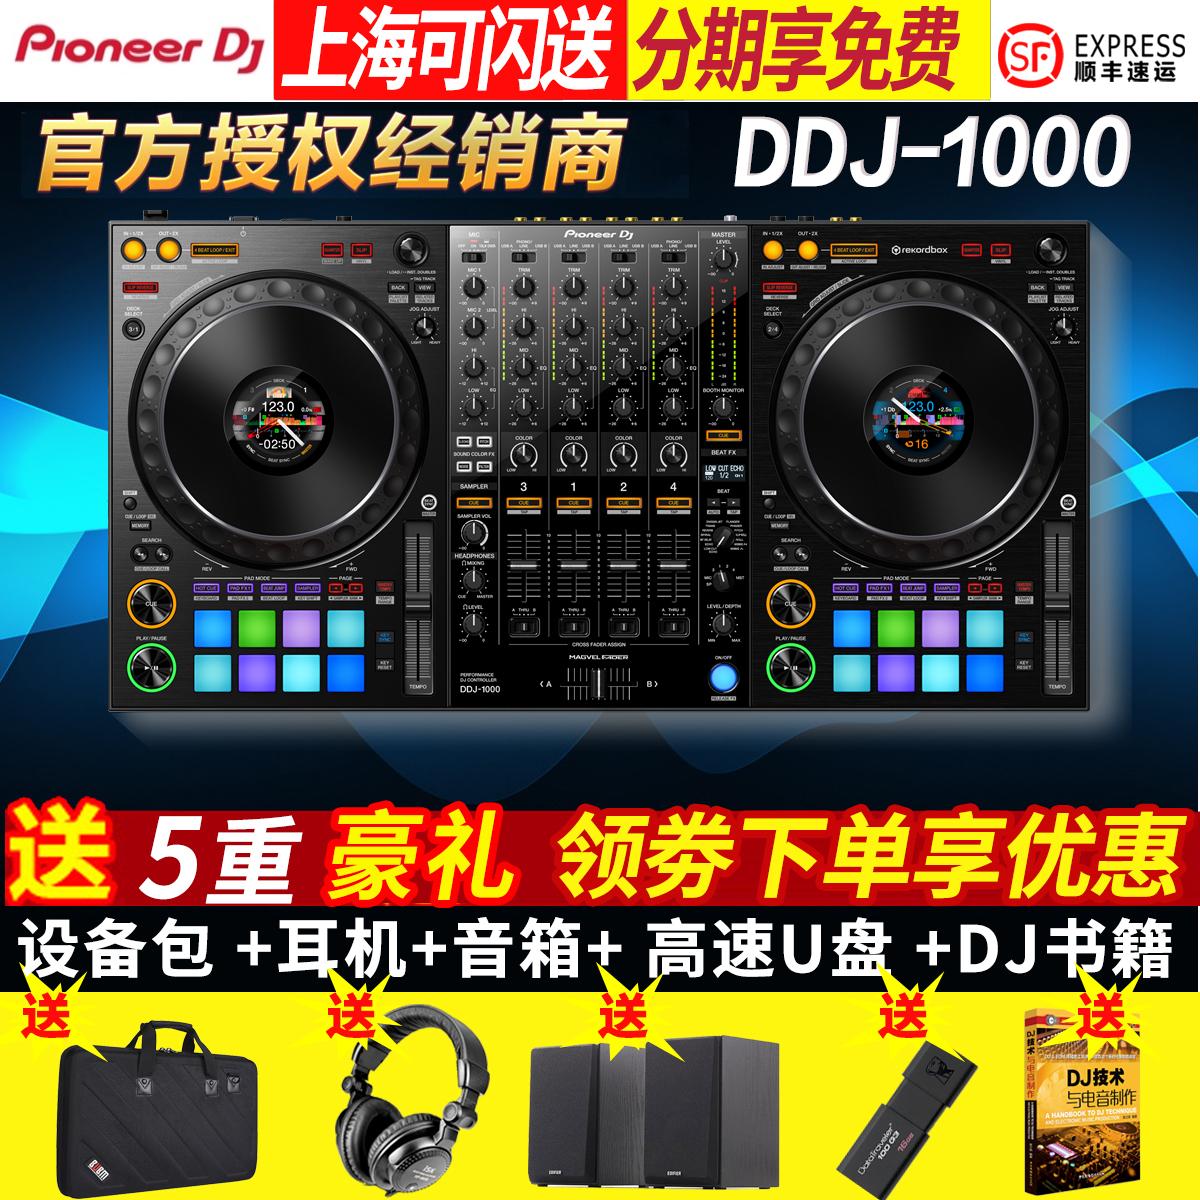 DJ установки / микшеры Артикул 565303199102